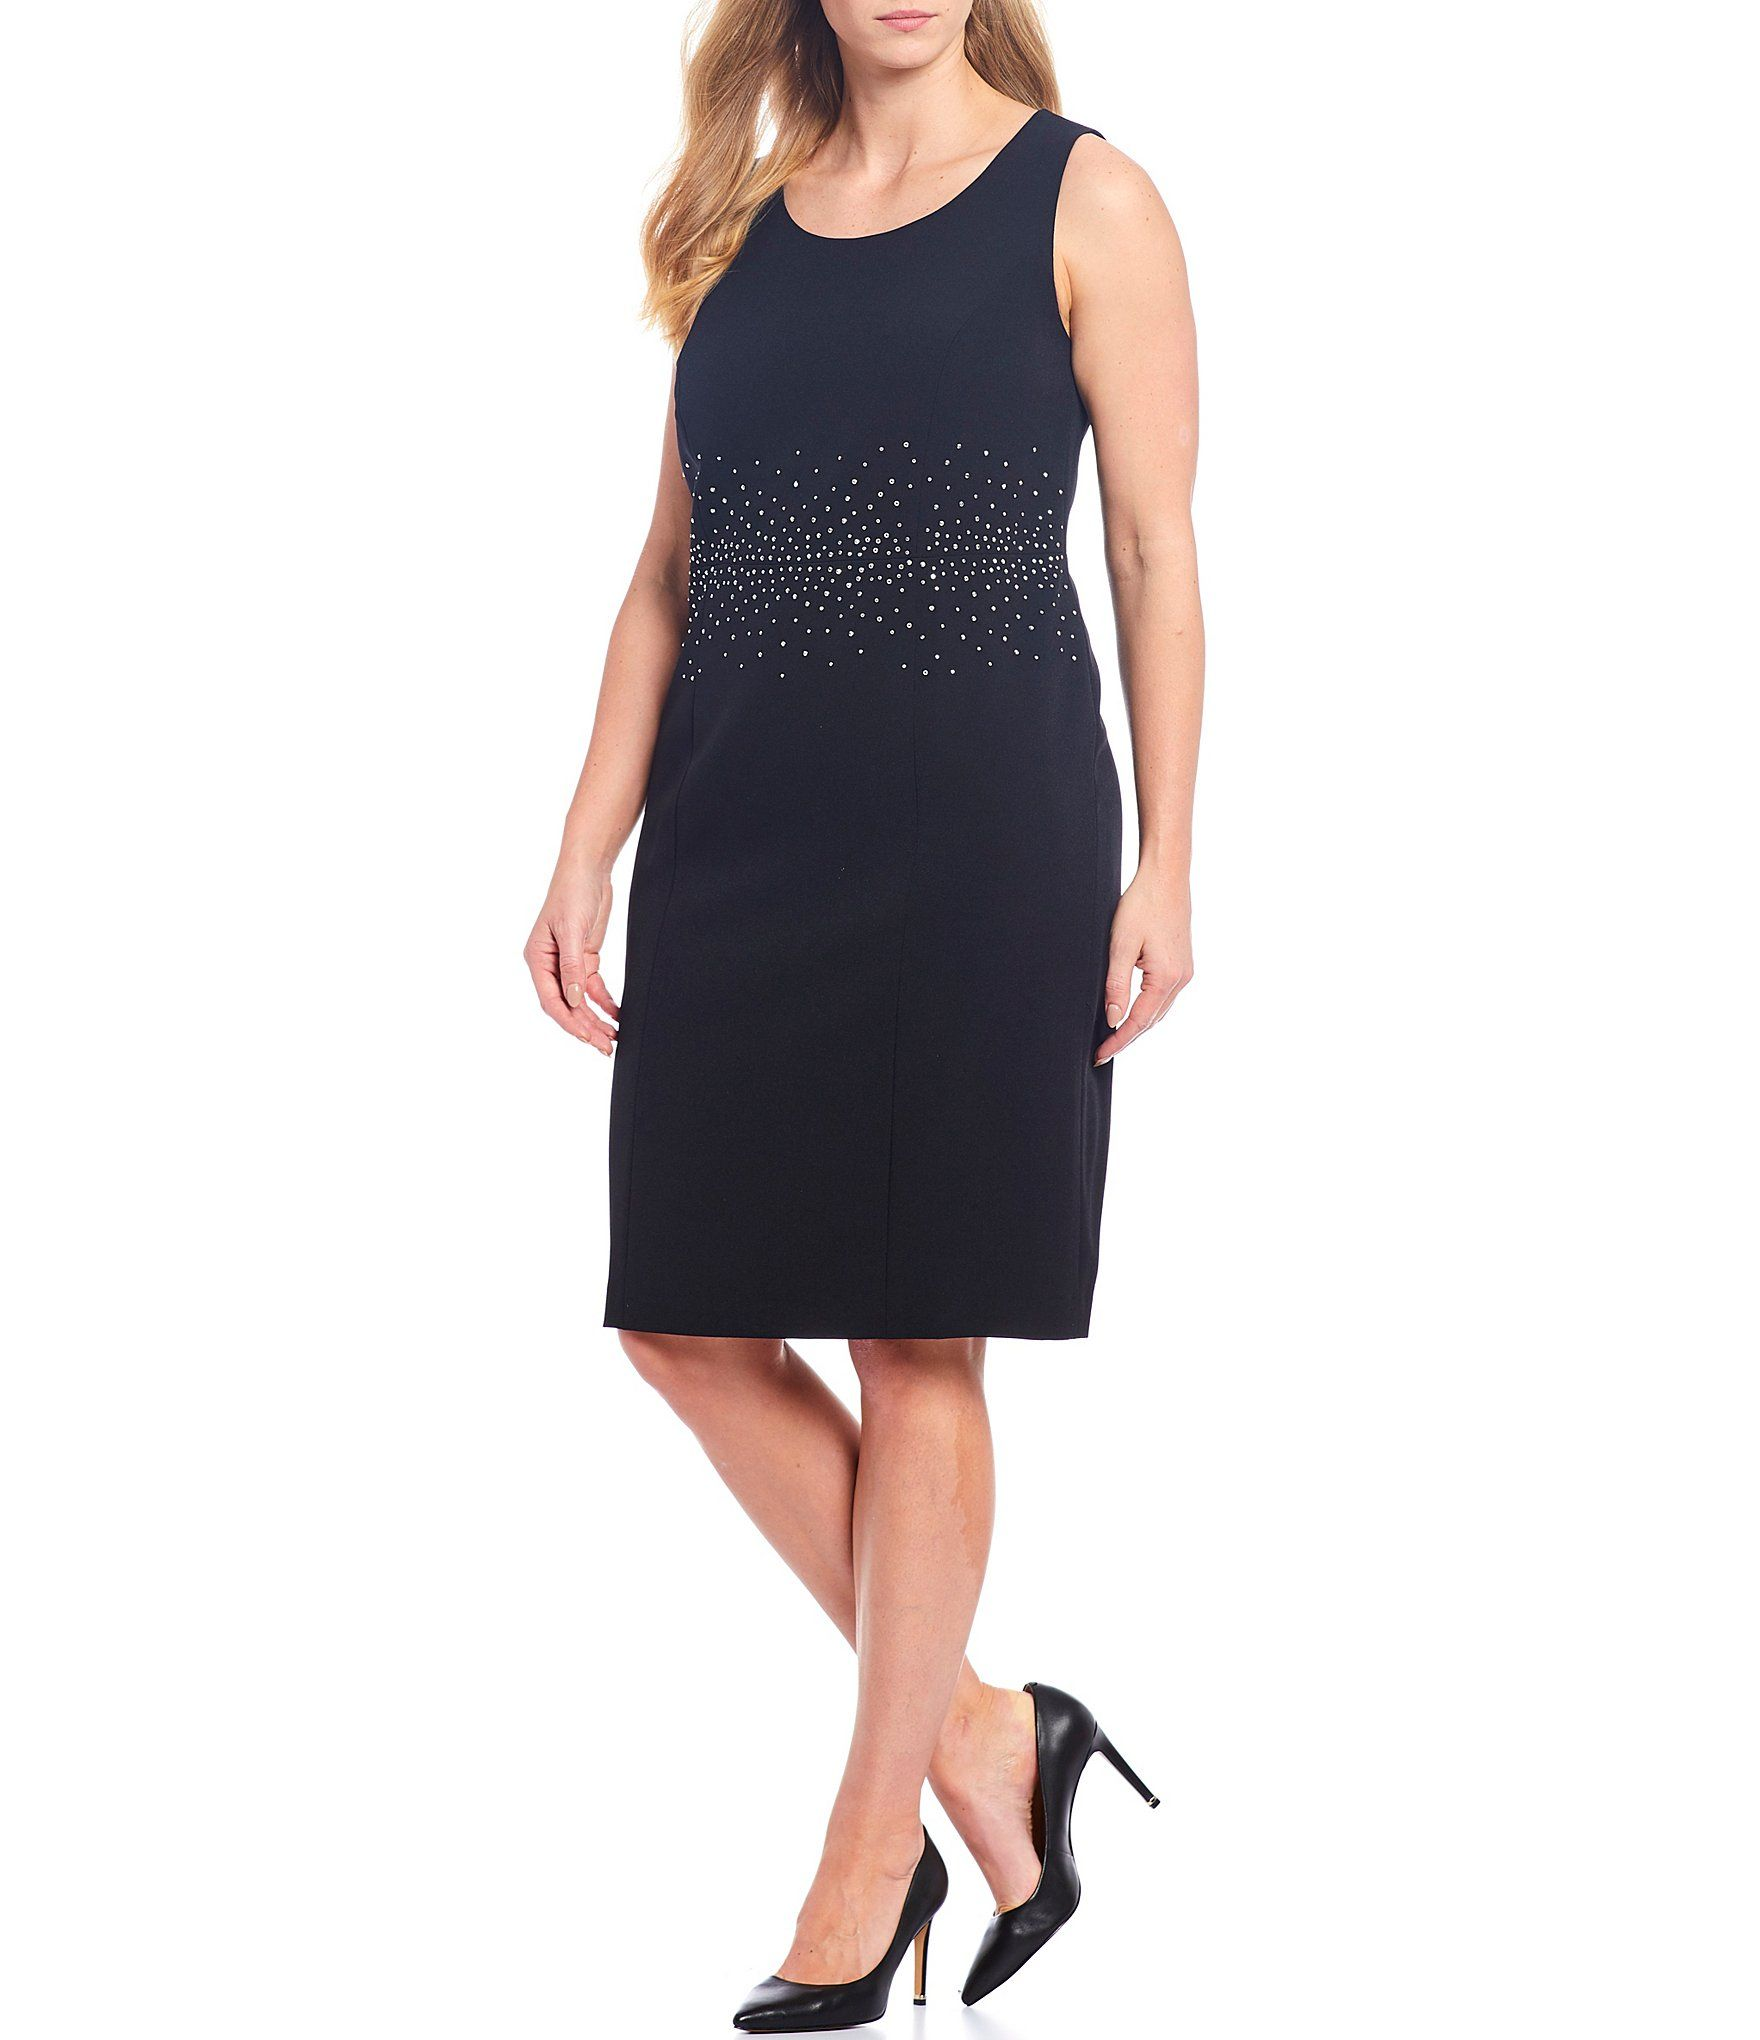 Kasper Plus Size Stretch Crepe Stud Trim Detailed Jewel Neck Sleeveless Dress | Dillard's